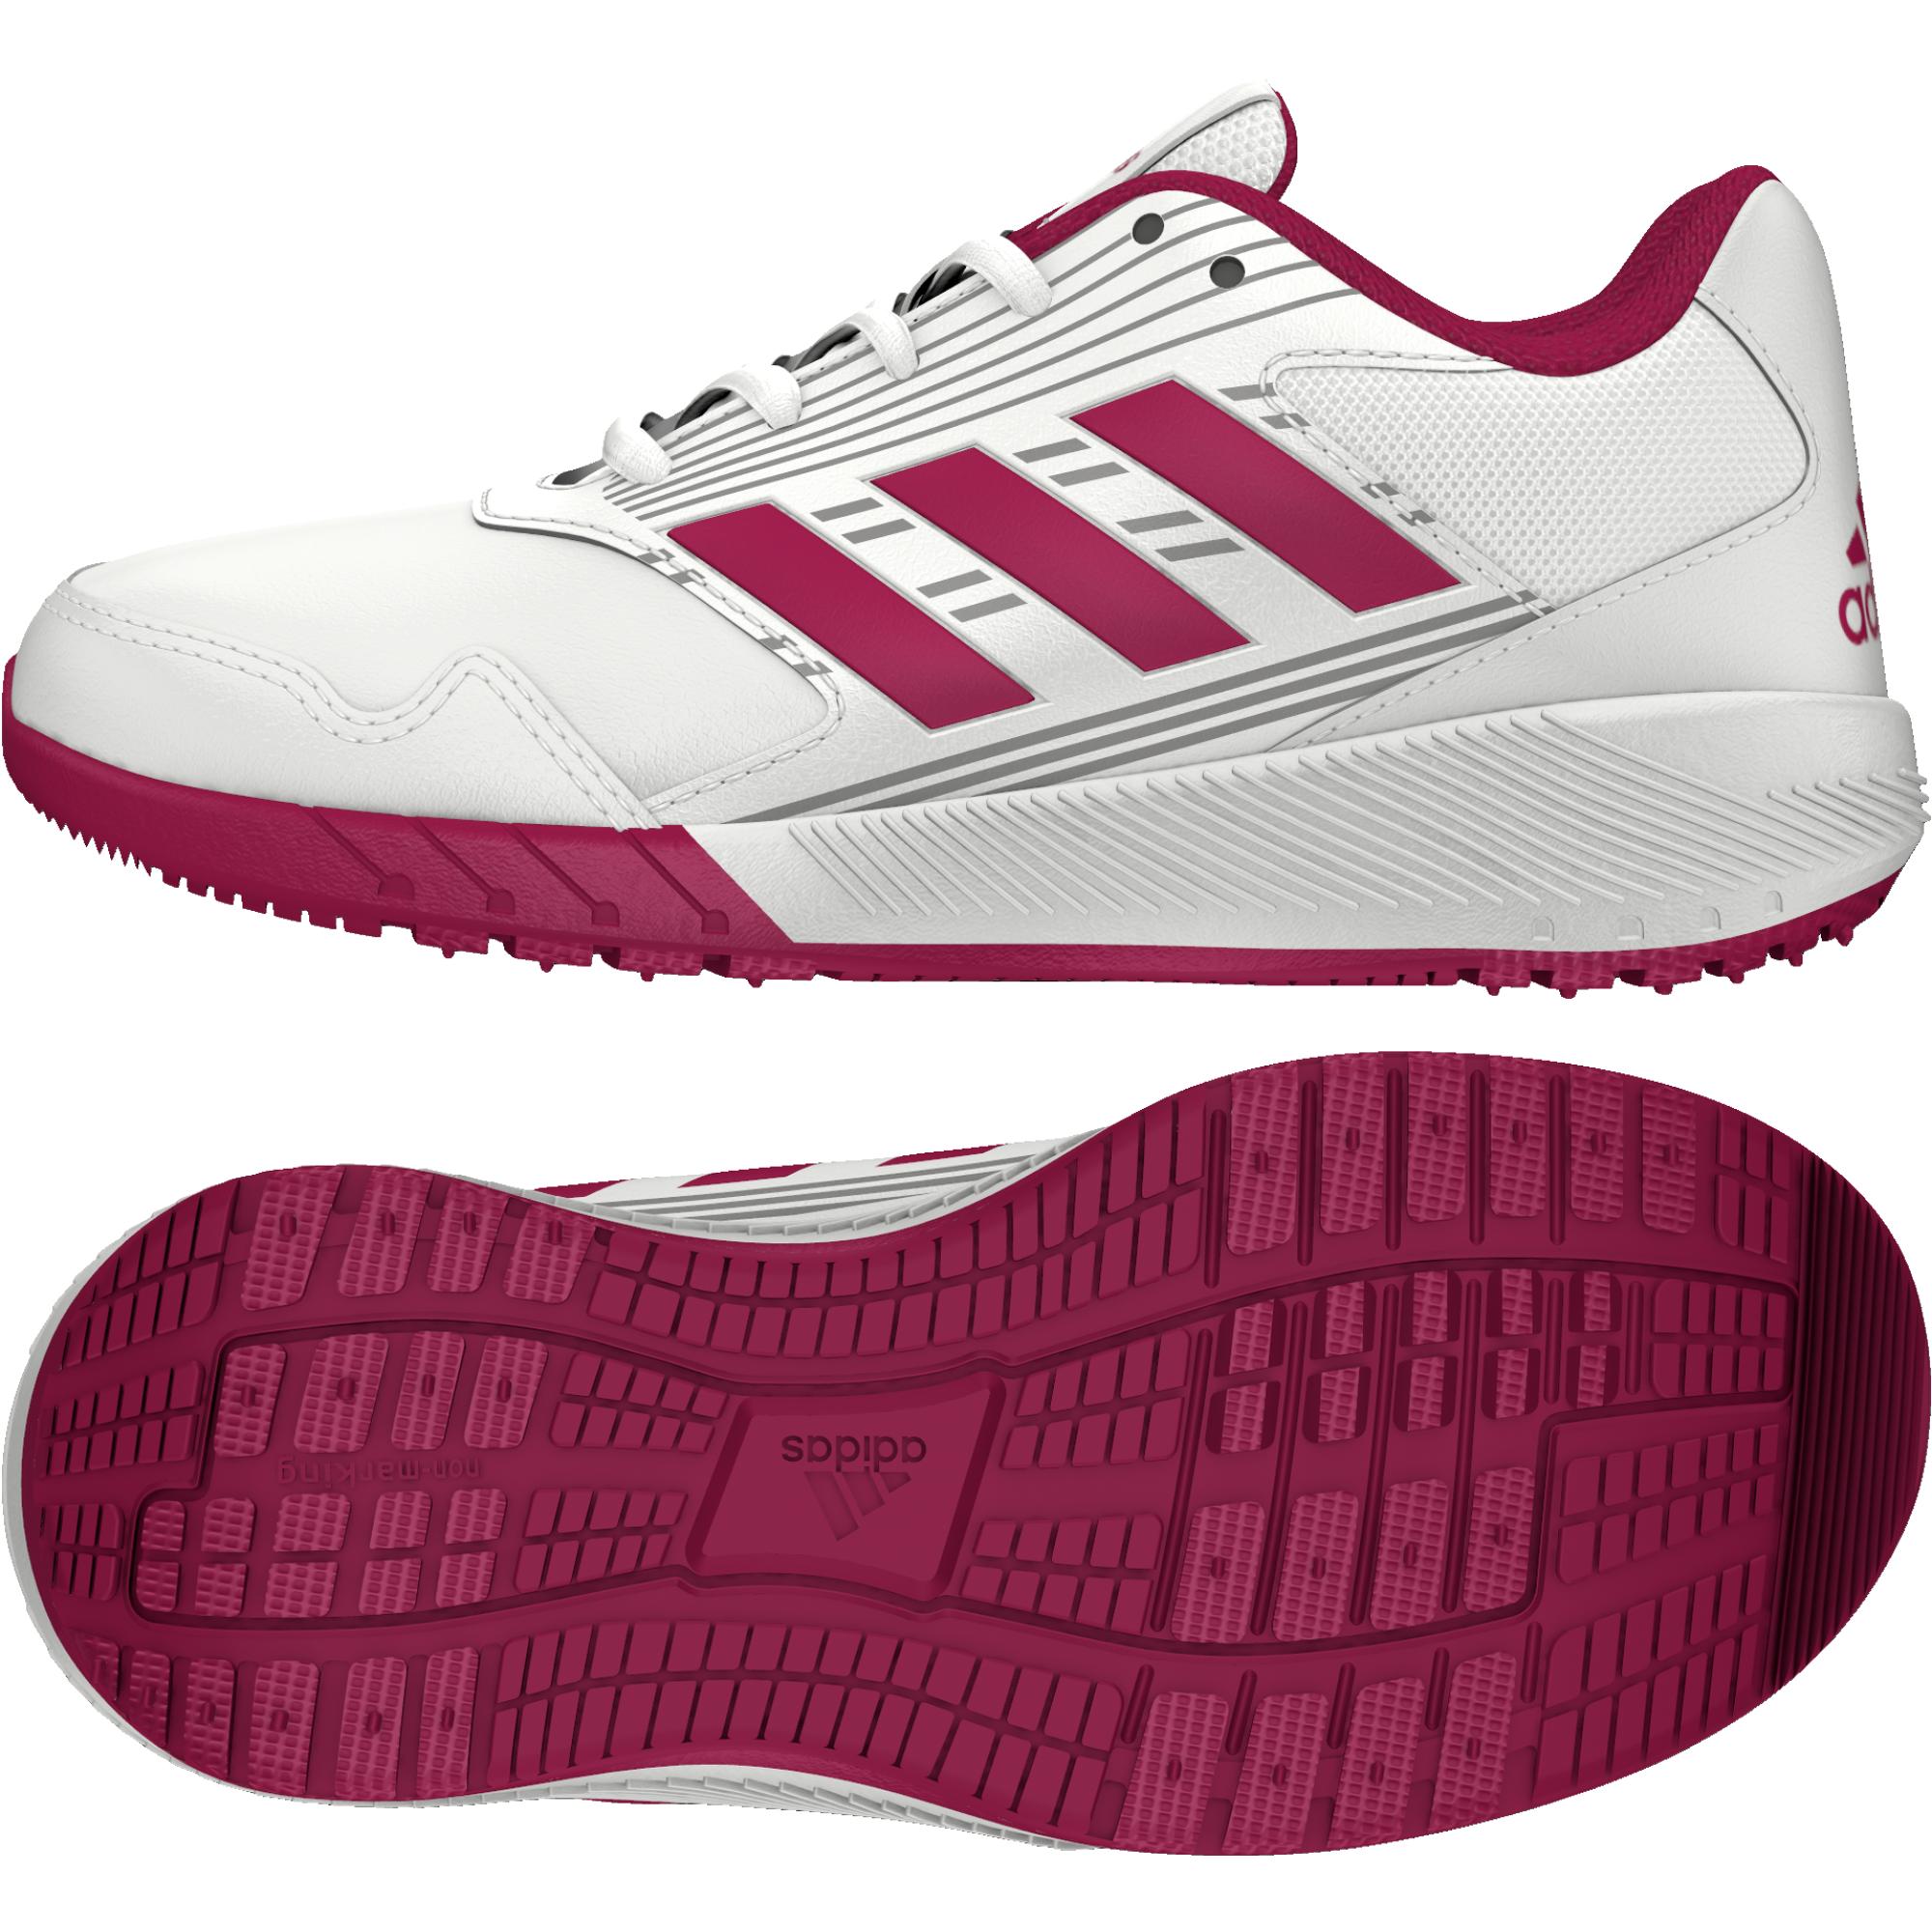 size 40 c670b 98bf6 Adidas Altarun K kamaszlány futócipő , Lány Gyerek cipő   futócipő ,  adidas performance , Adidas Altarun K kamaszlány futócipő